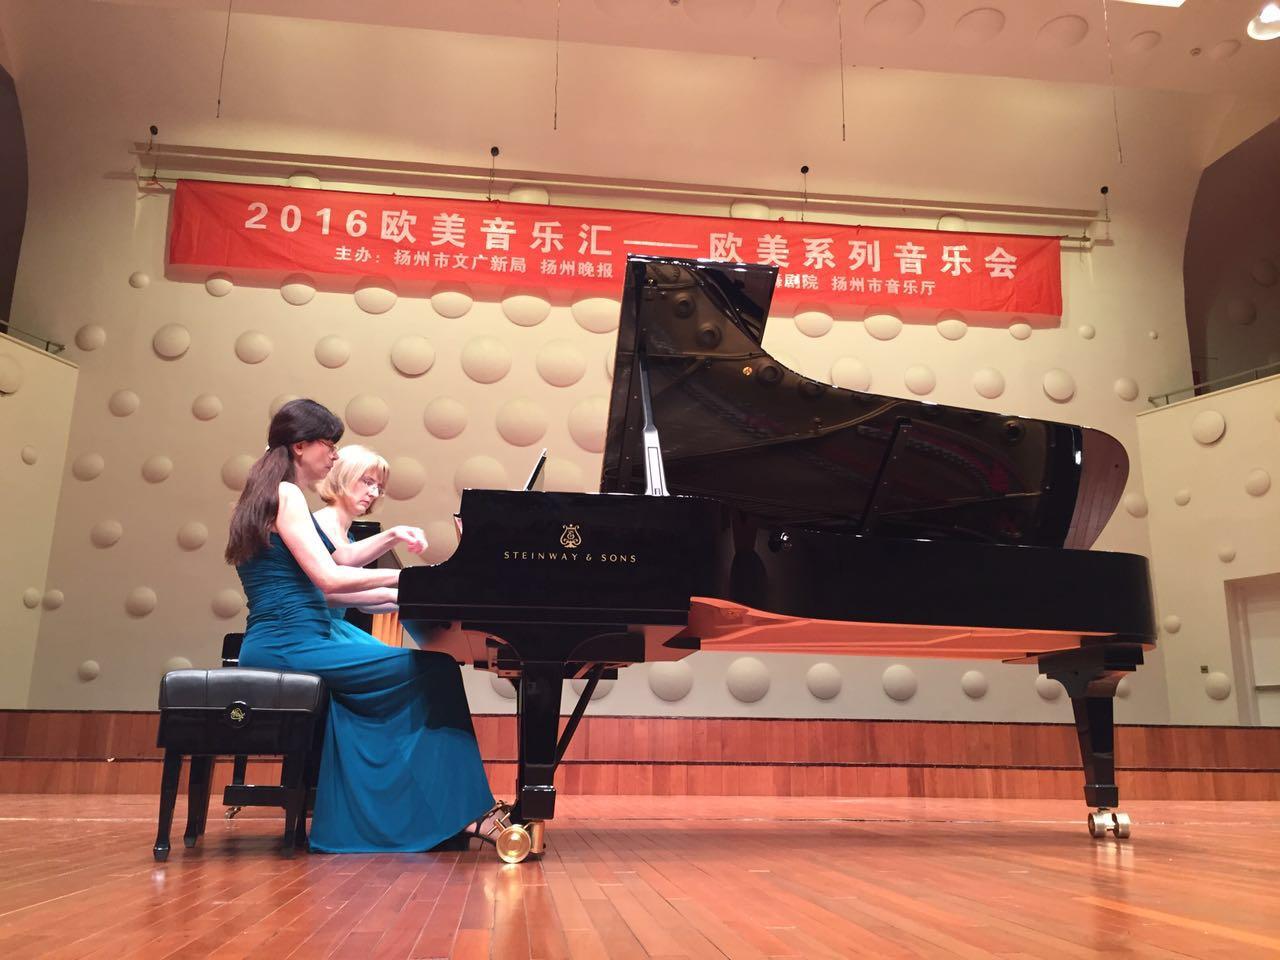 Yangzhou Concert Hall